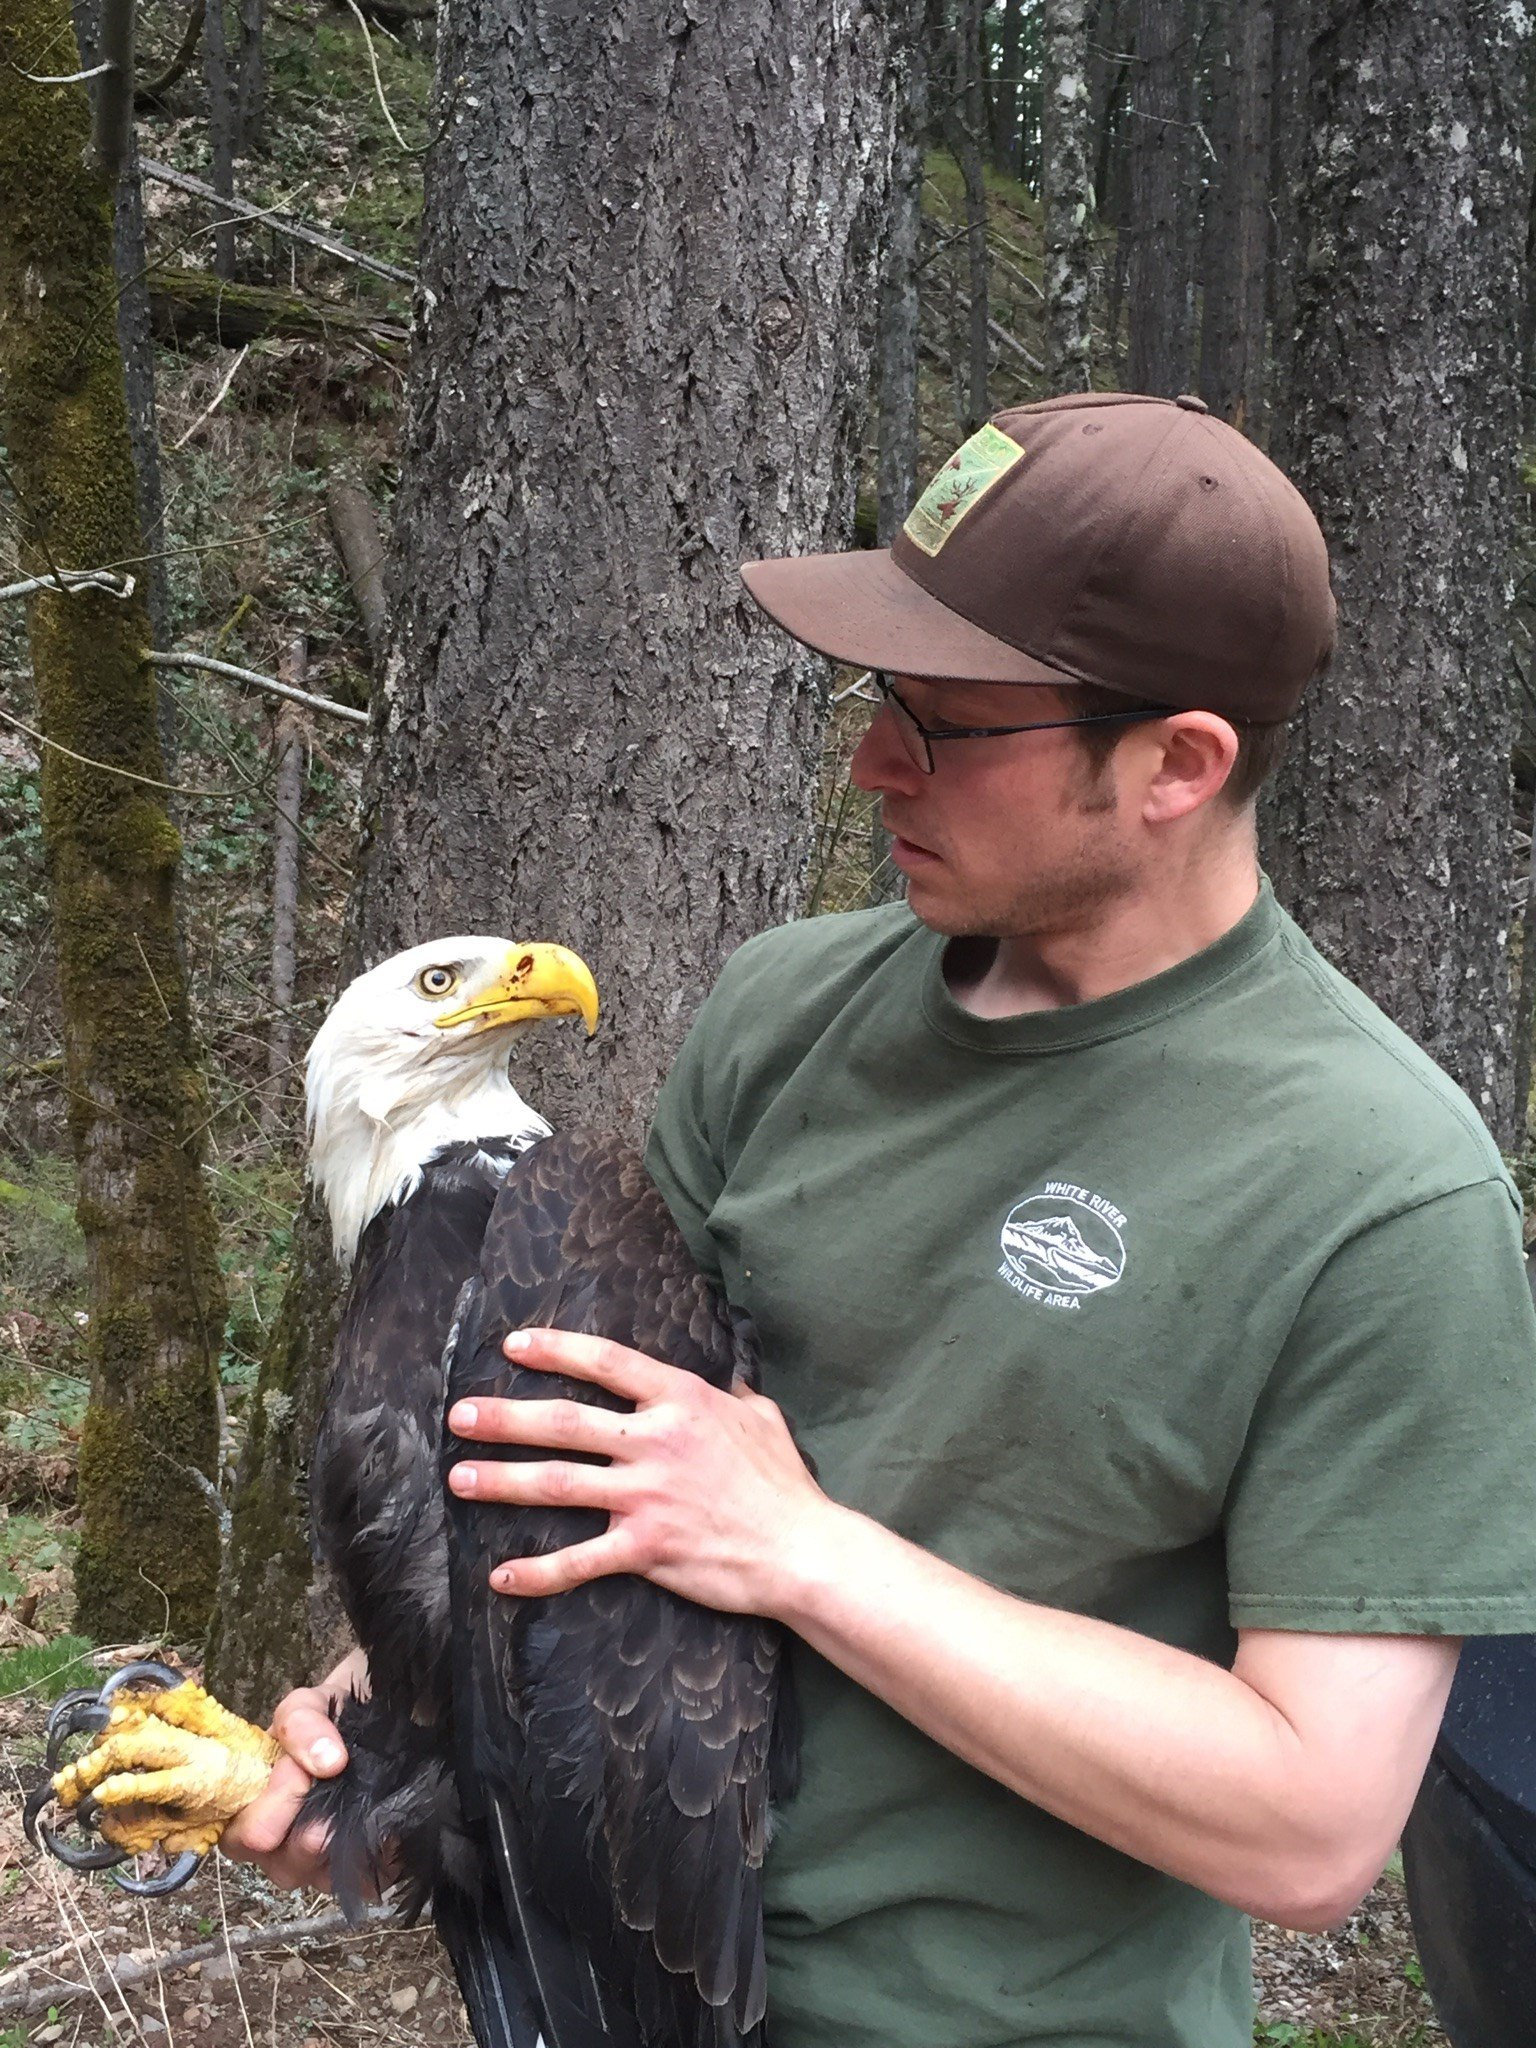 (Oregon State Police/Oregon Dept. of Fish & Wildlife)